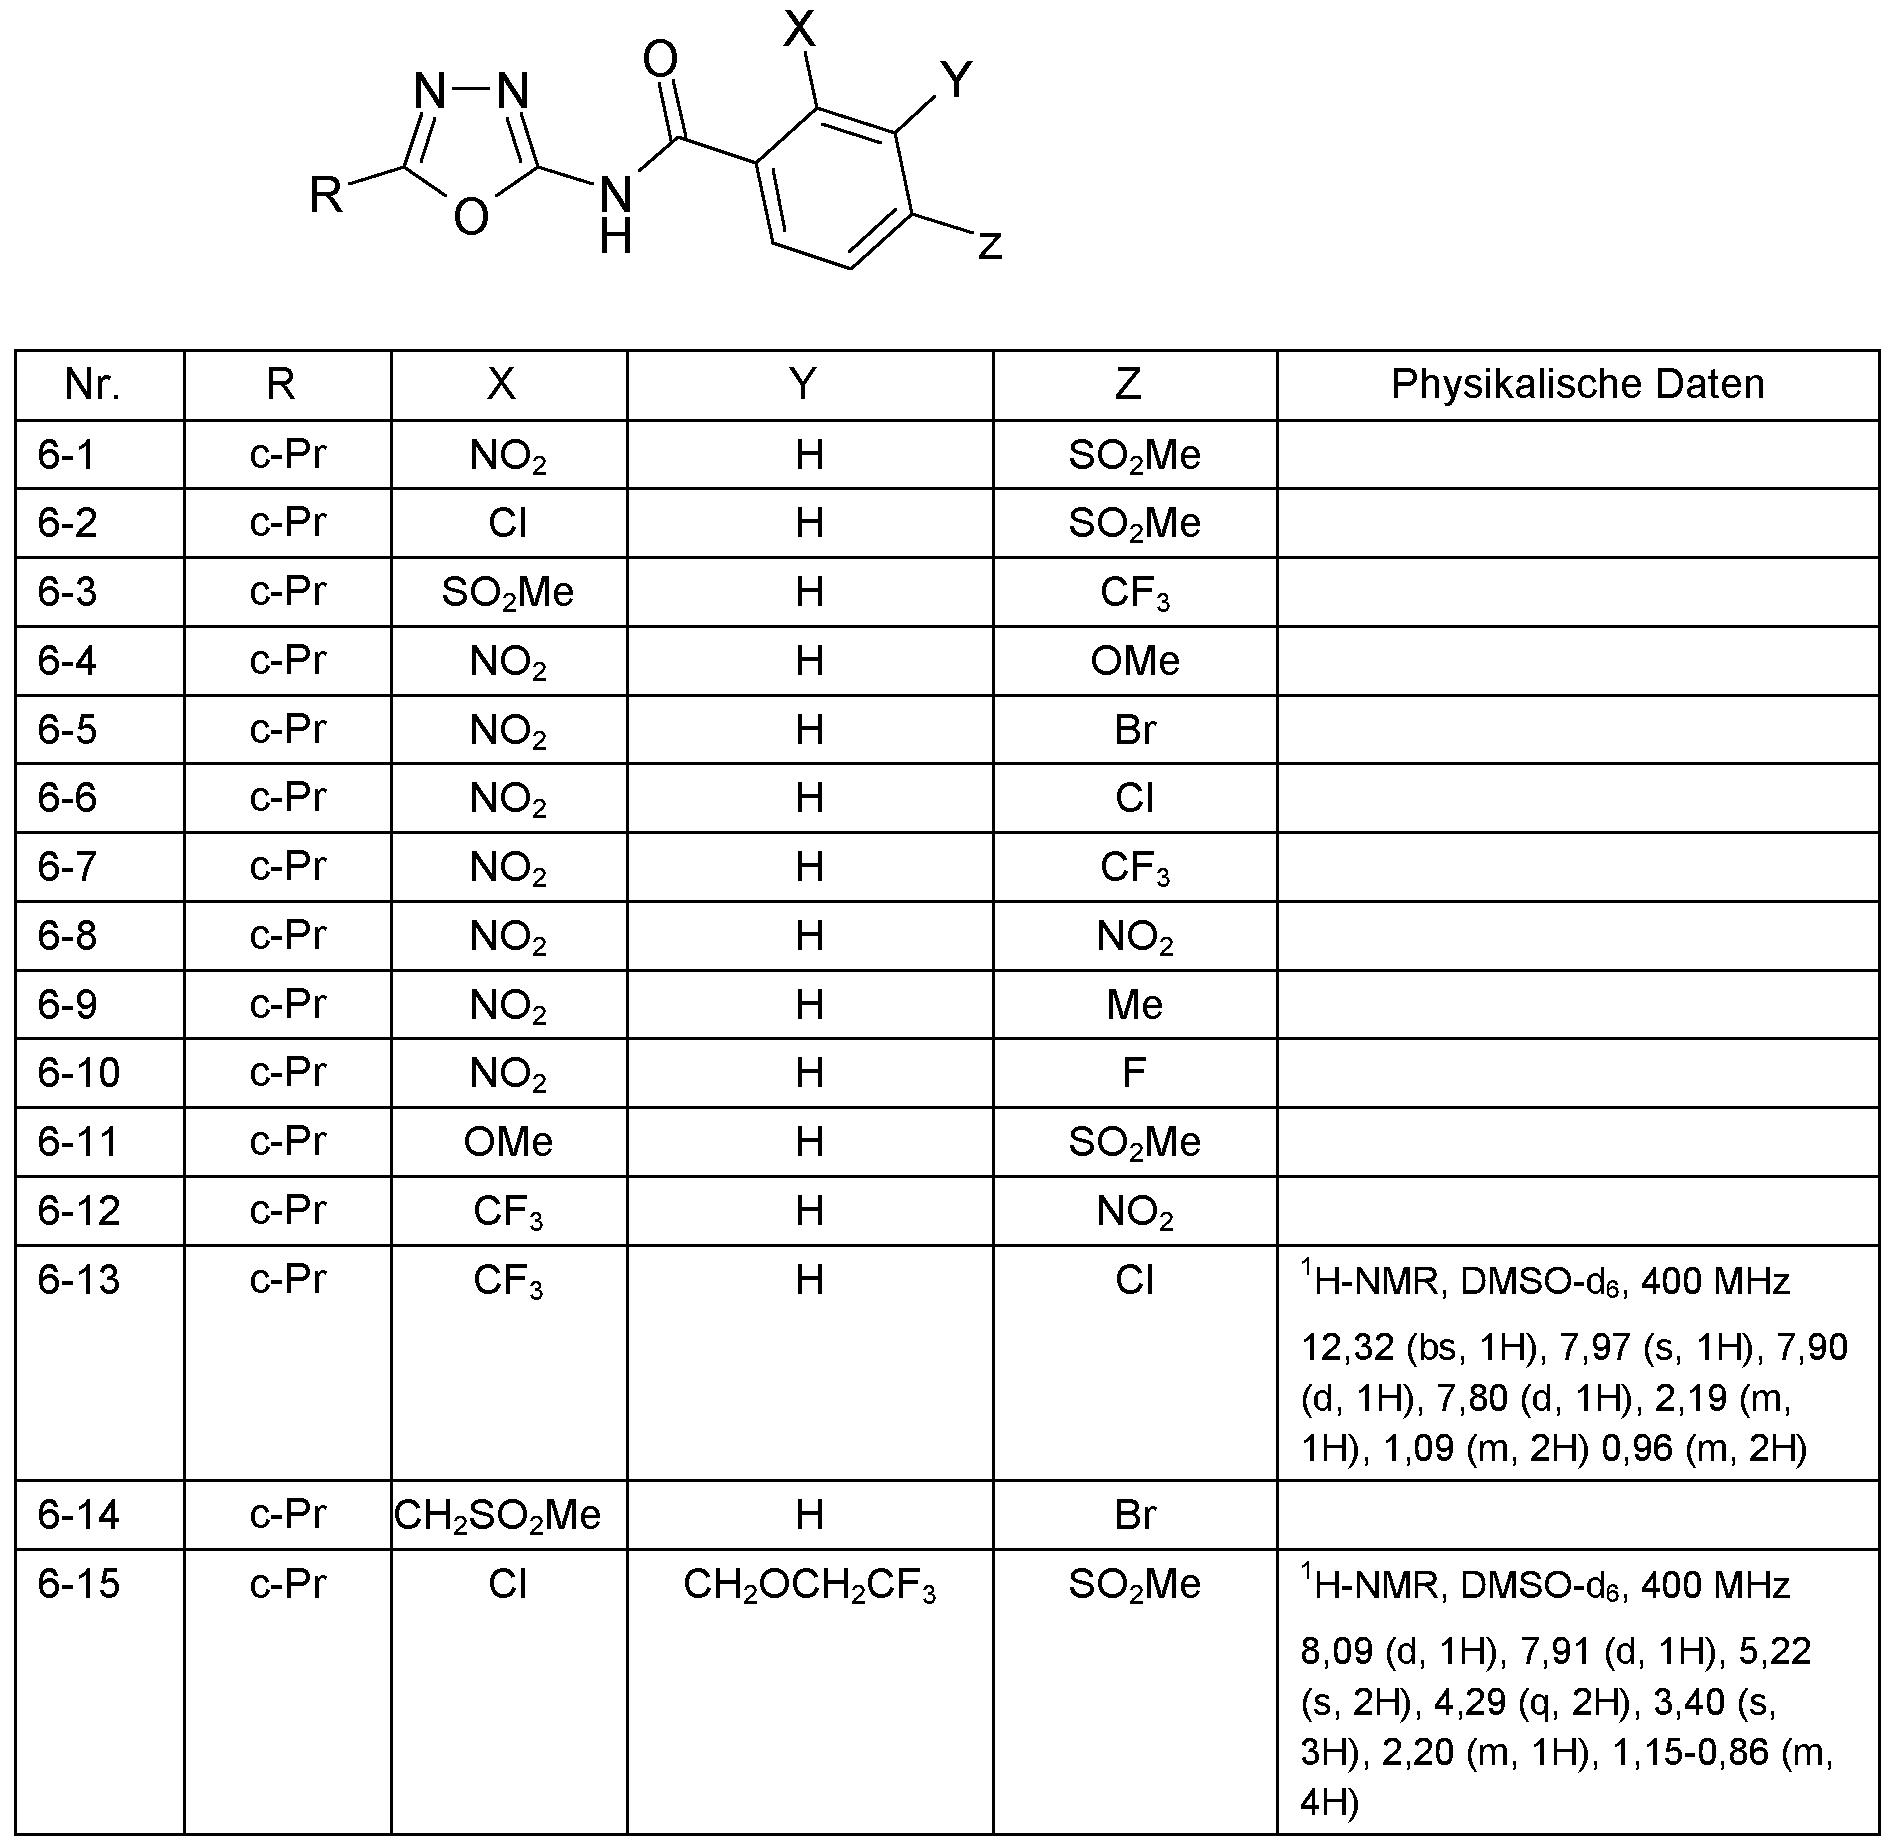 propranolol mechanism of action